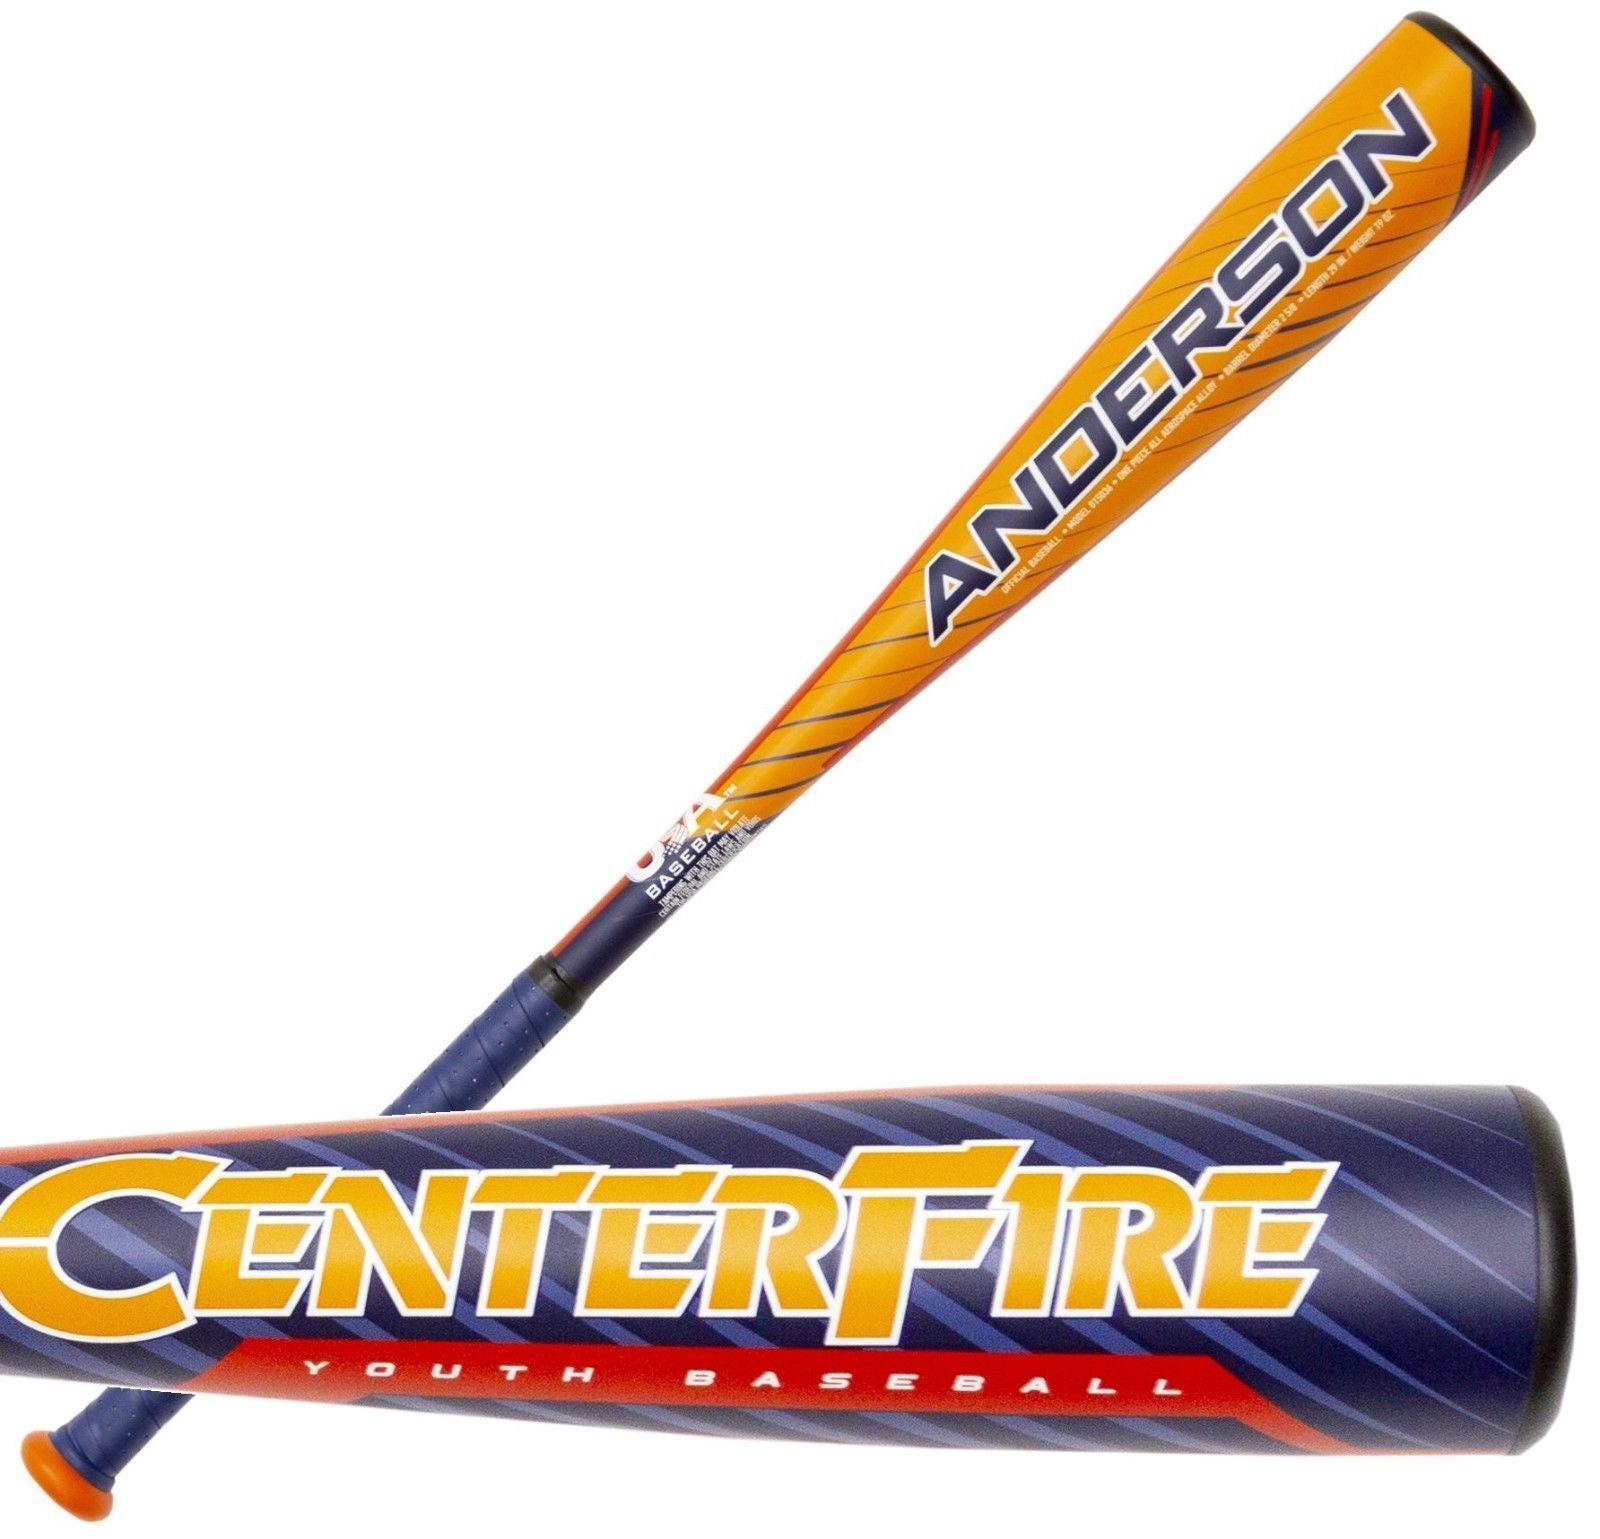 2019 Anderson centerfire, -10 29  19 OZ Juventud usa bate de béisbol 015036